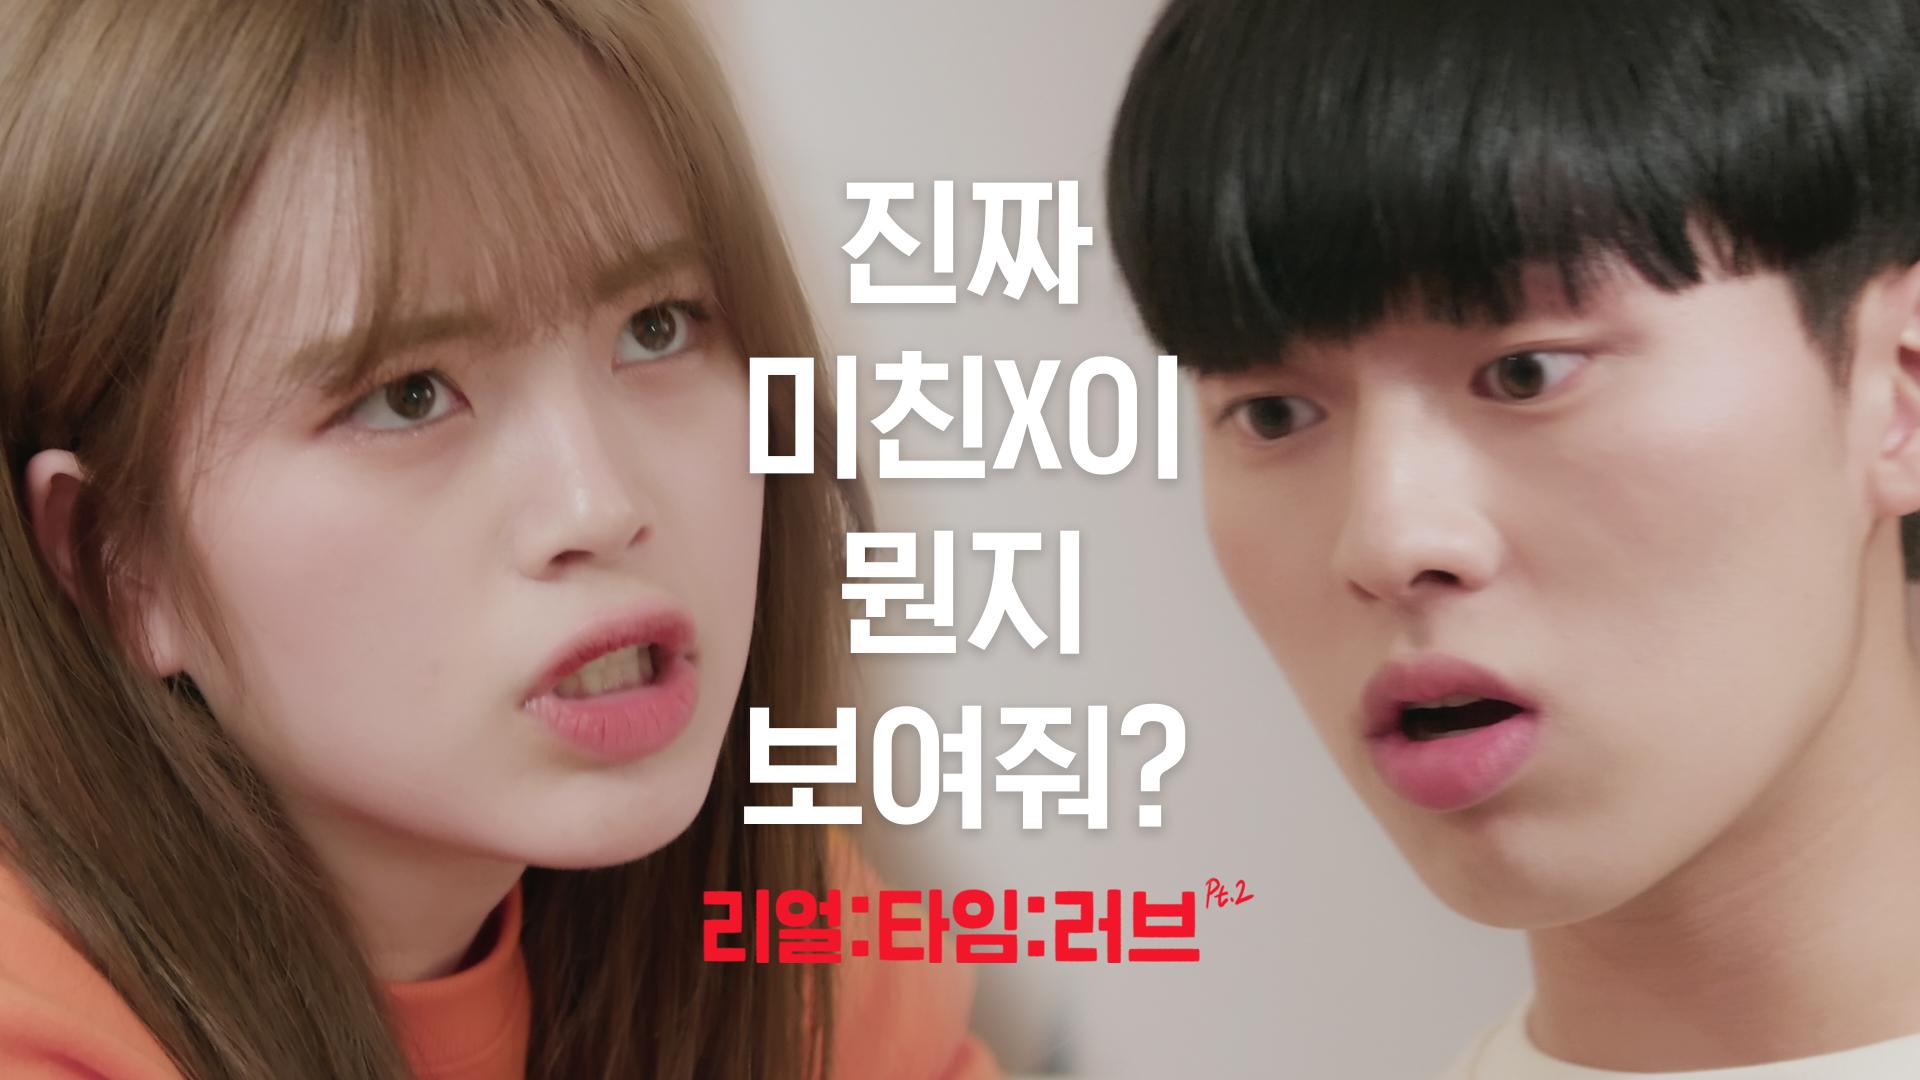 TMI 주의ㅋㅋ웹드에서 처음보는 독보적 캐릭터 '연예찬' 미리보기 [리얼:타임:러브2] 선공개